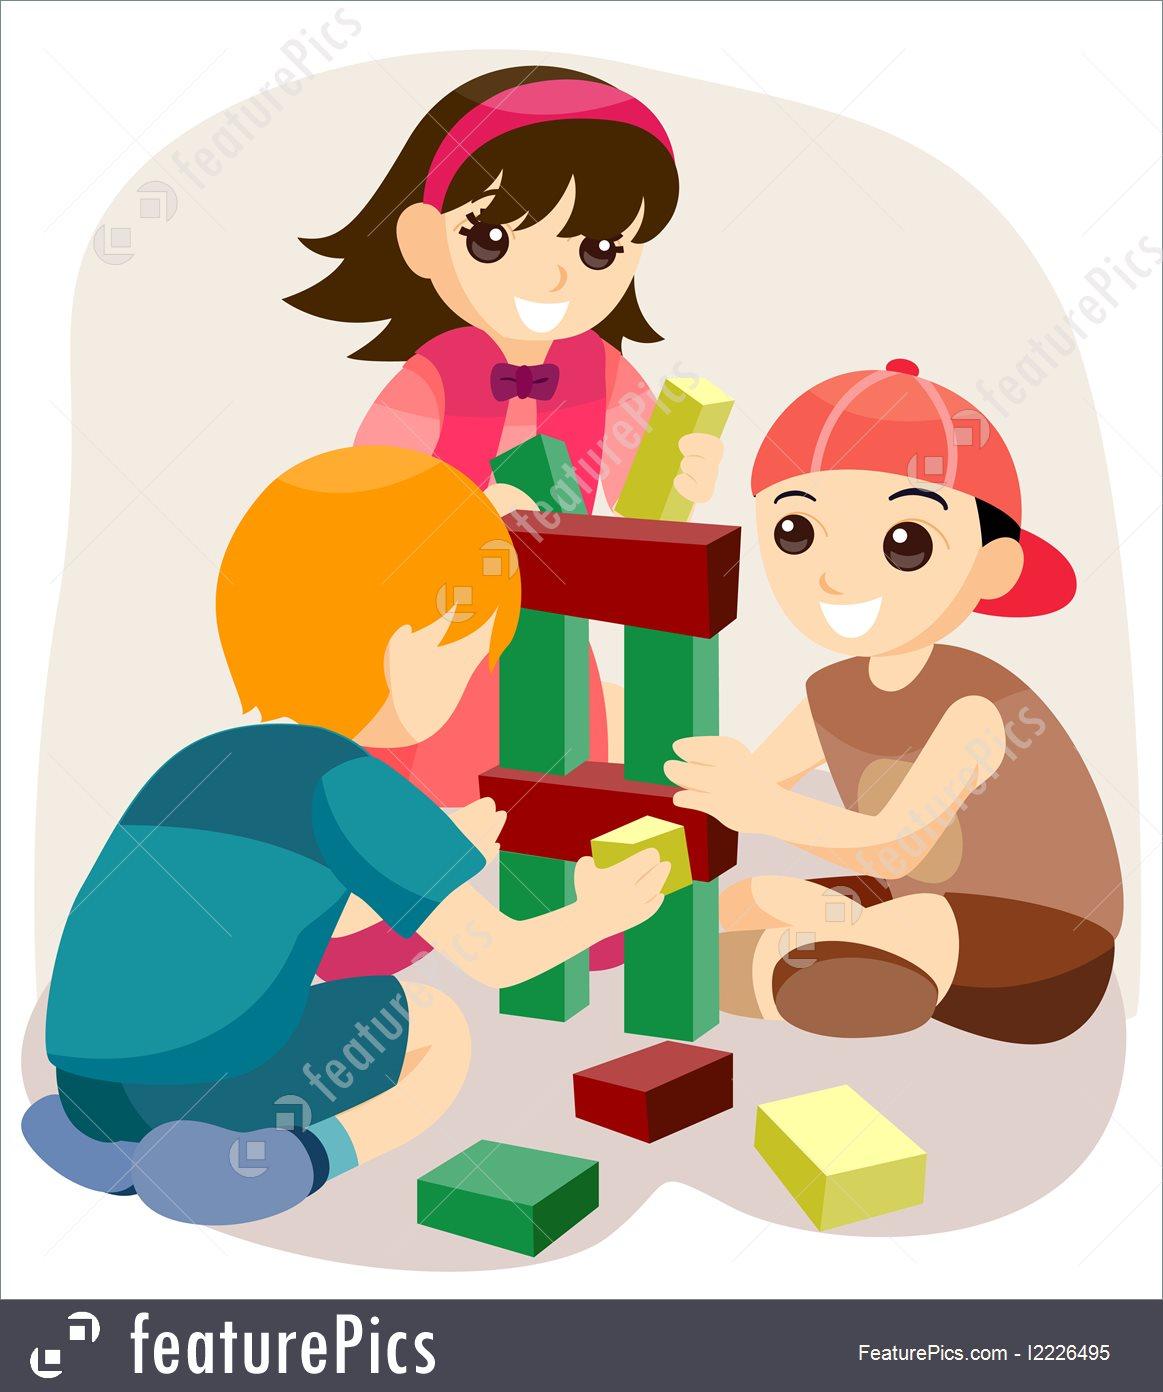 Toys And Souvenirs: Building Blocks.